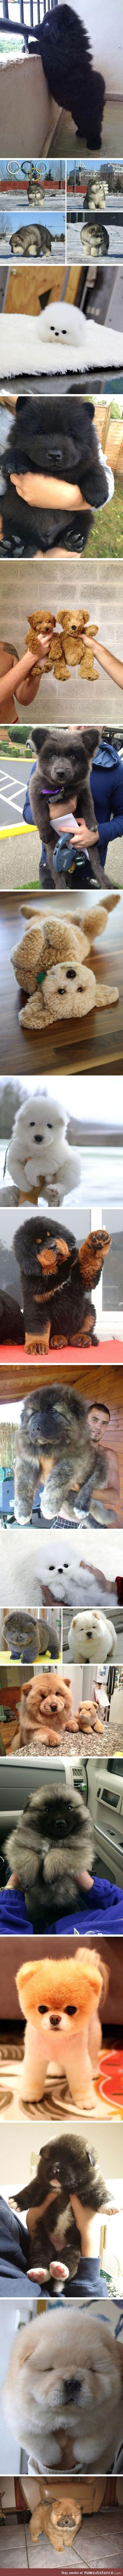 """chubby puppies that look like teddy bears"""